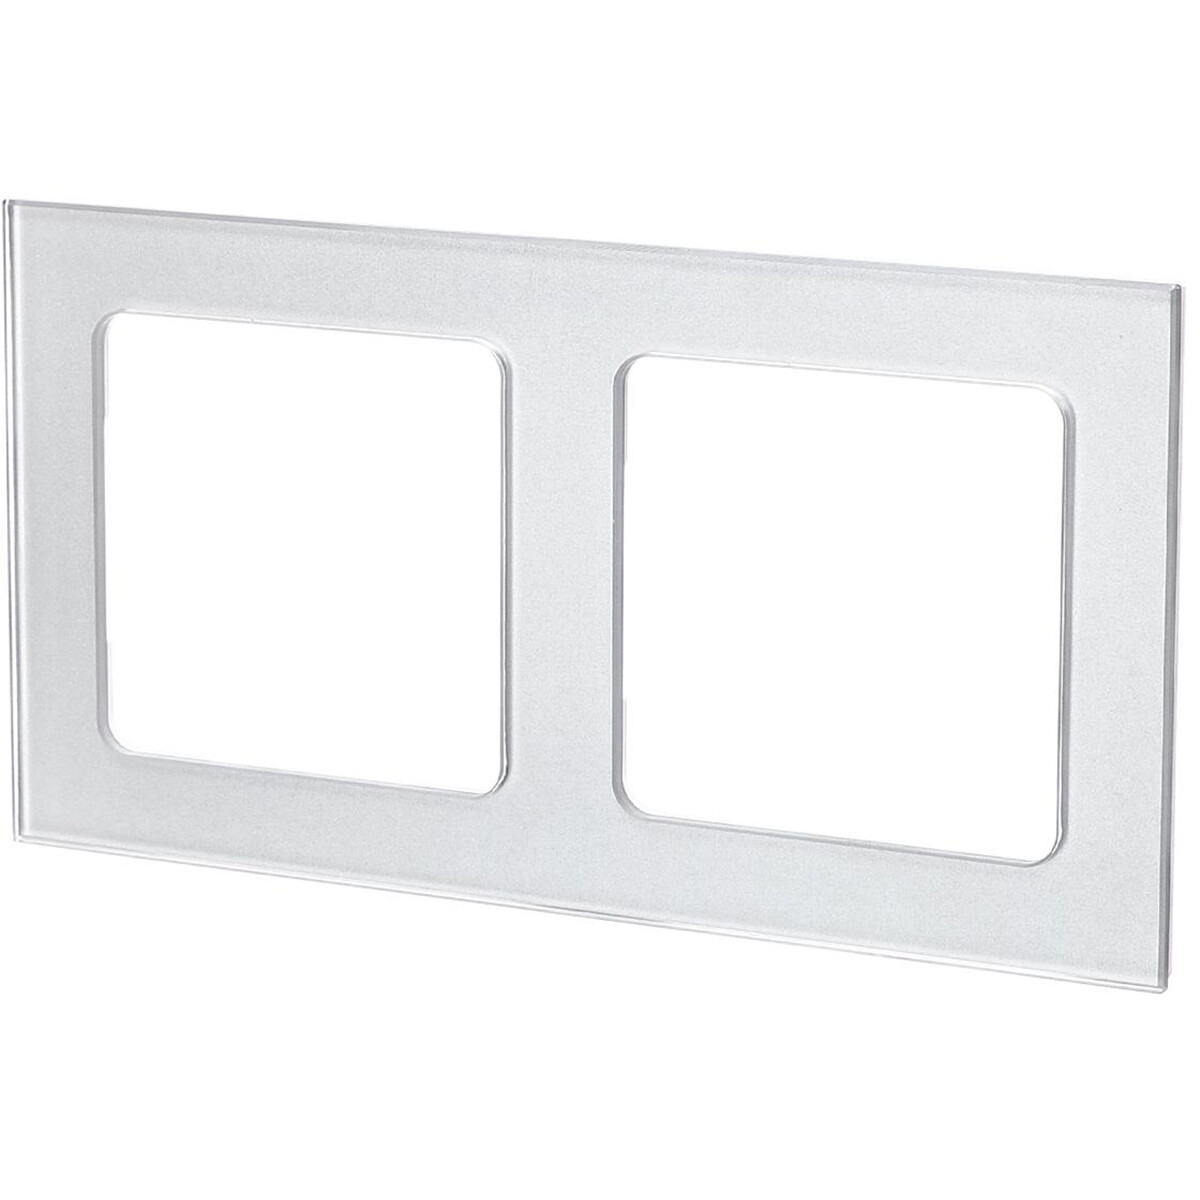 Afdekraam - Aigi Jura - 2-voudig - Vierkant - Glas - Zilver